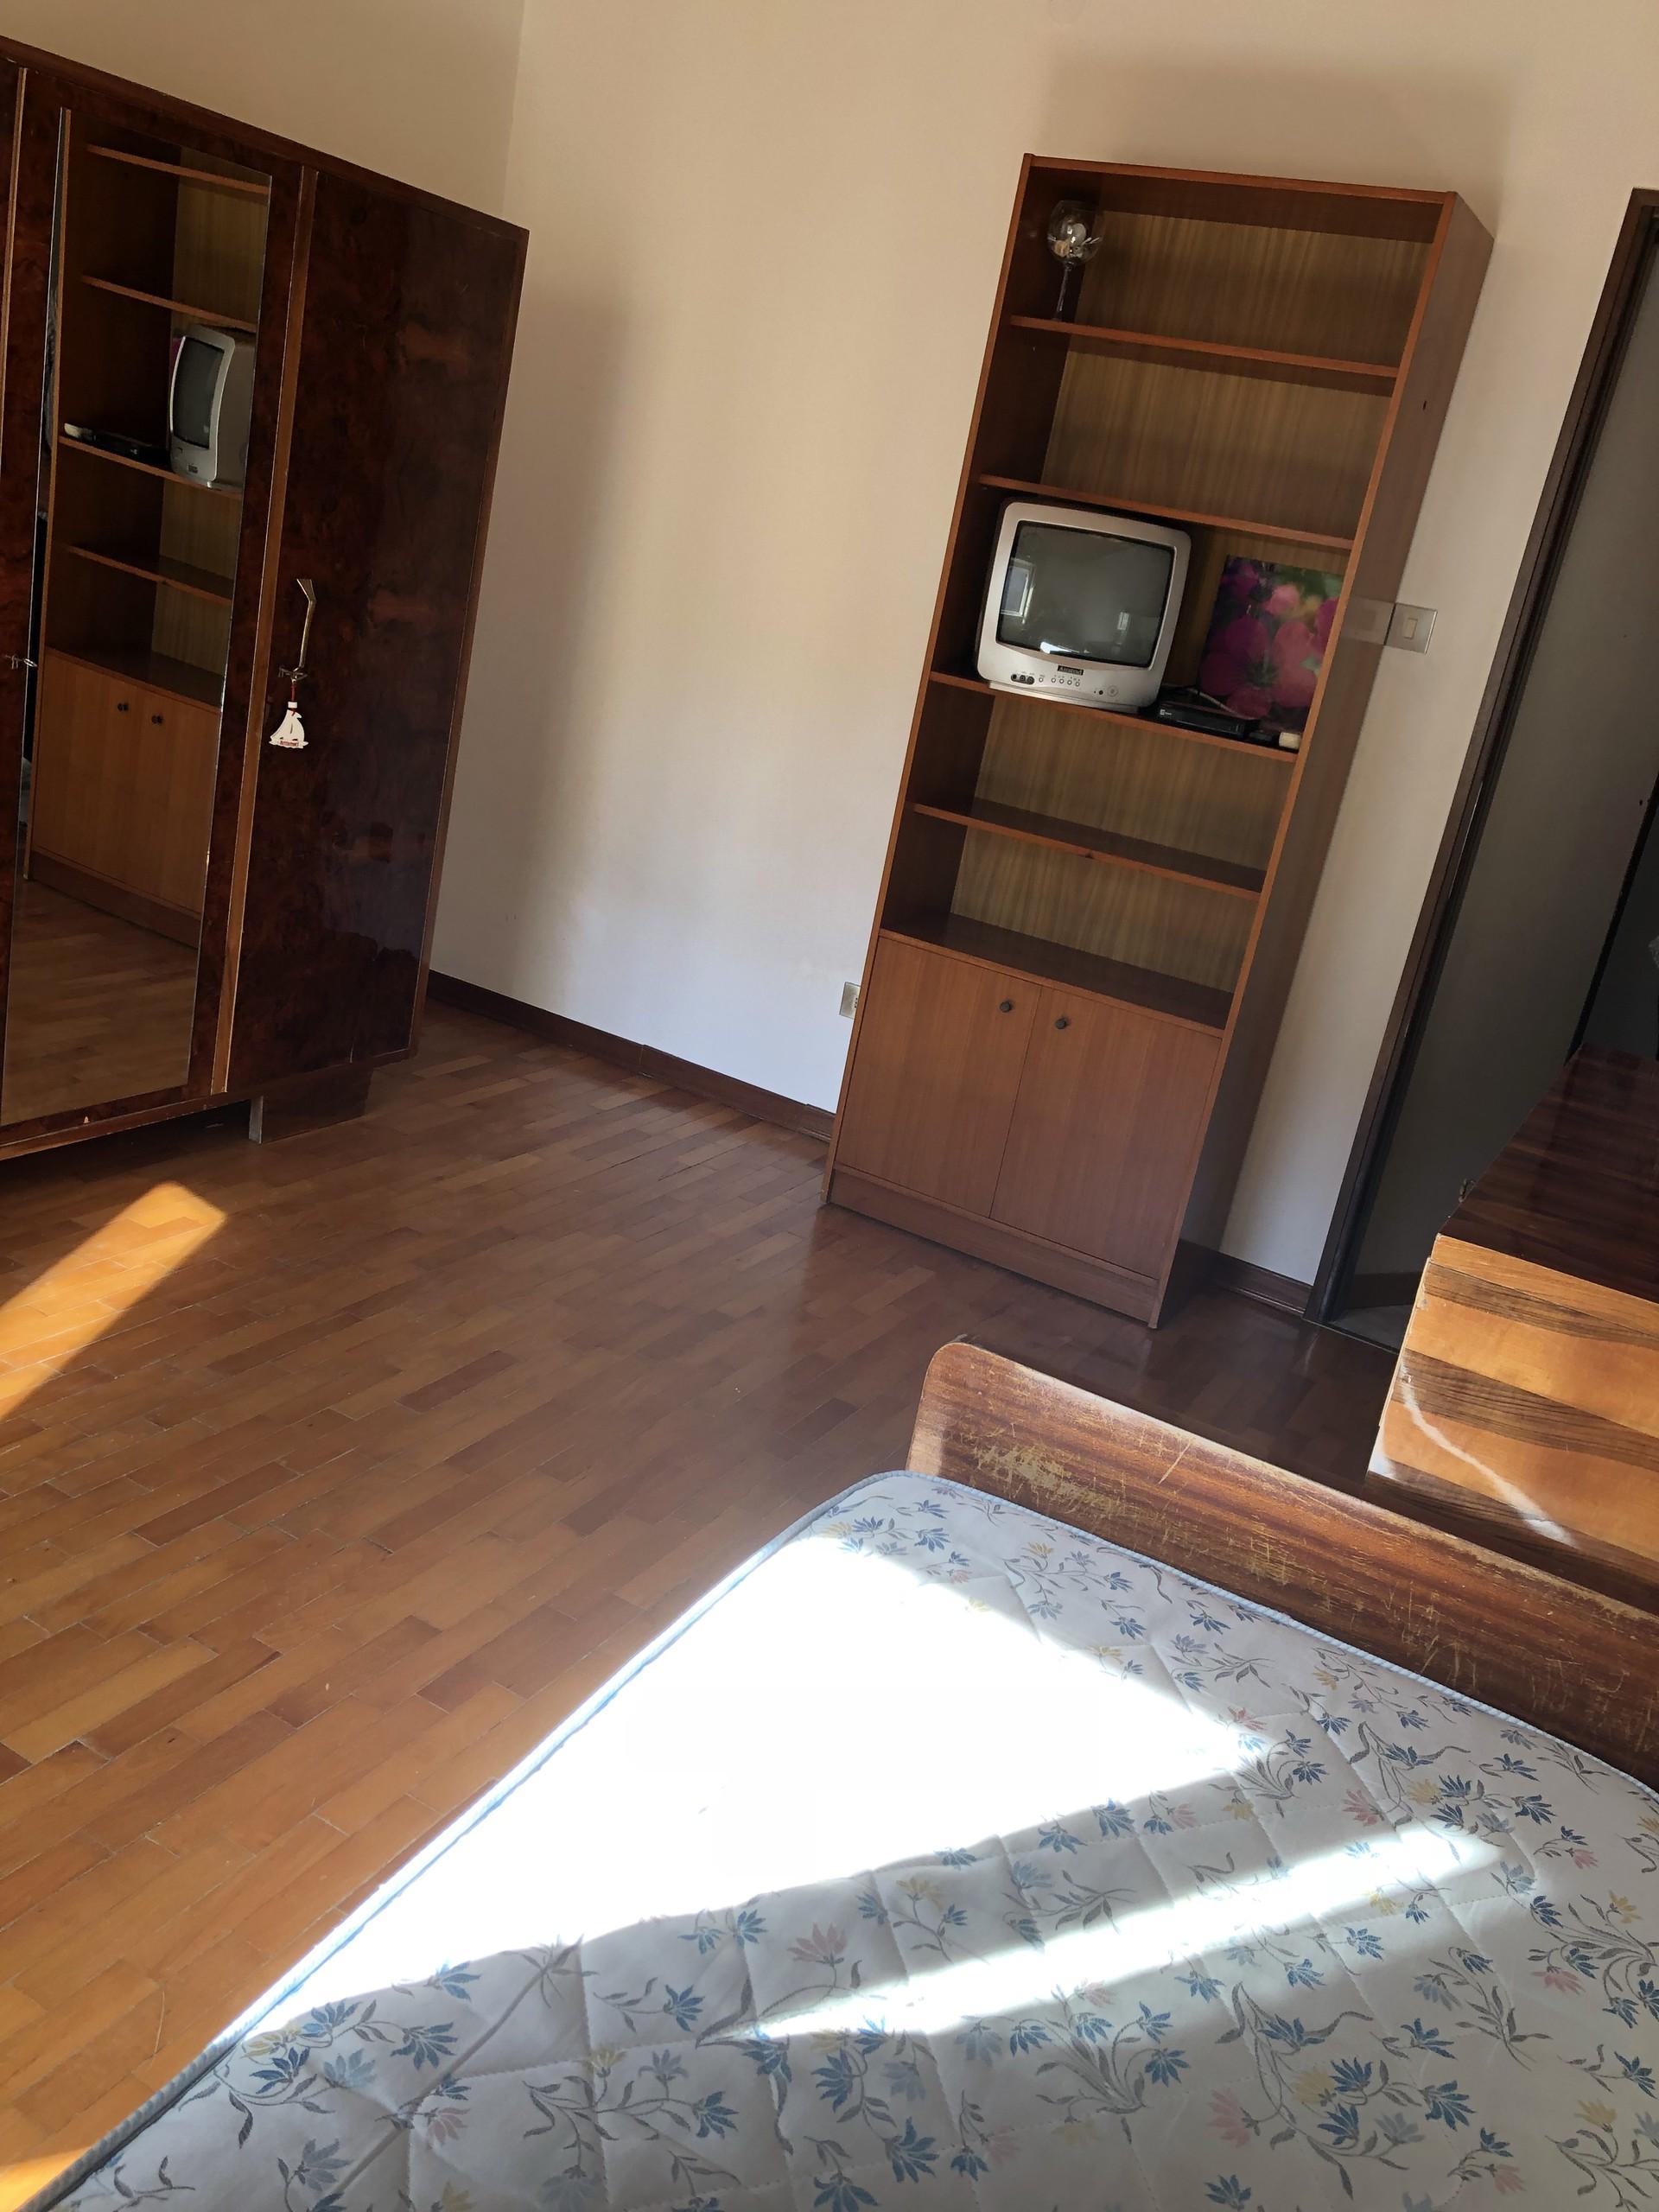 Via dei Giuliani, 34137 Trieste TS, Italia